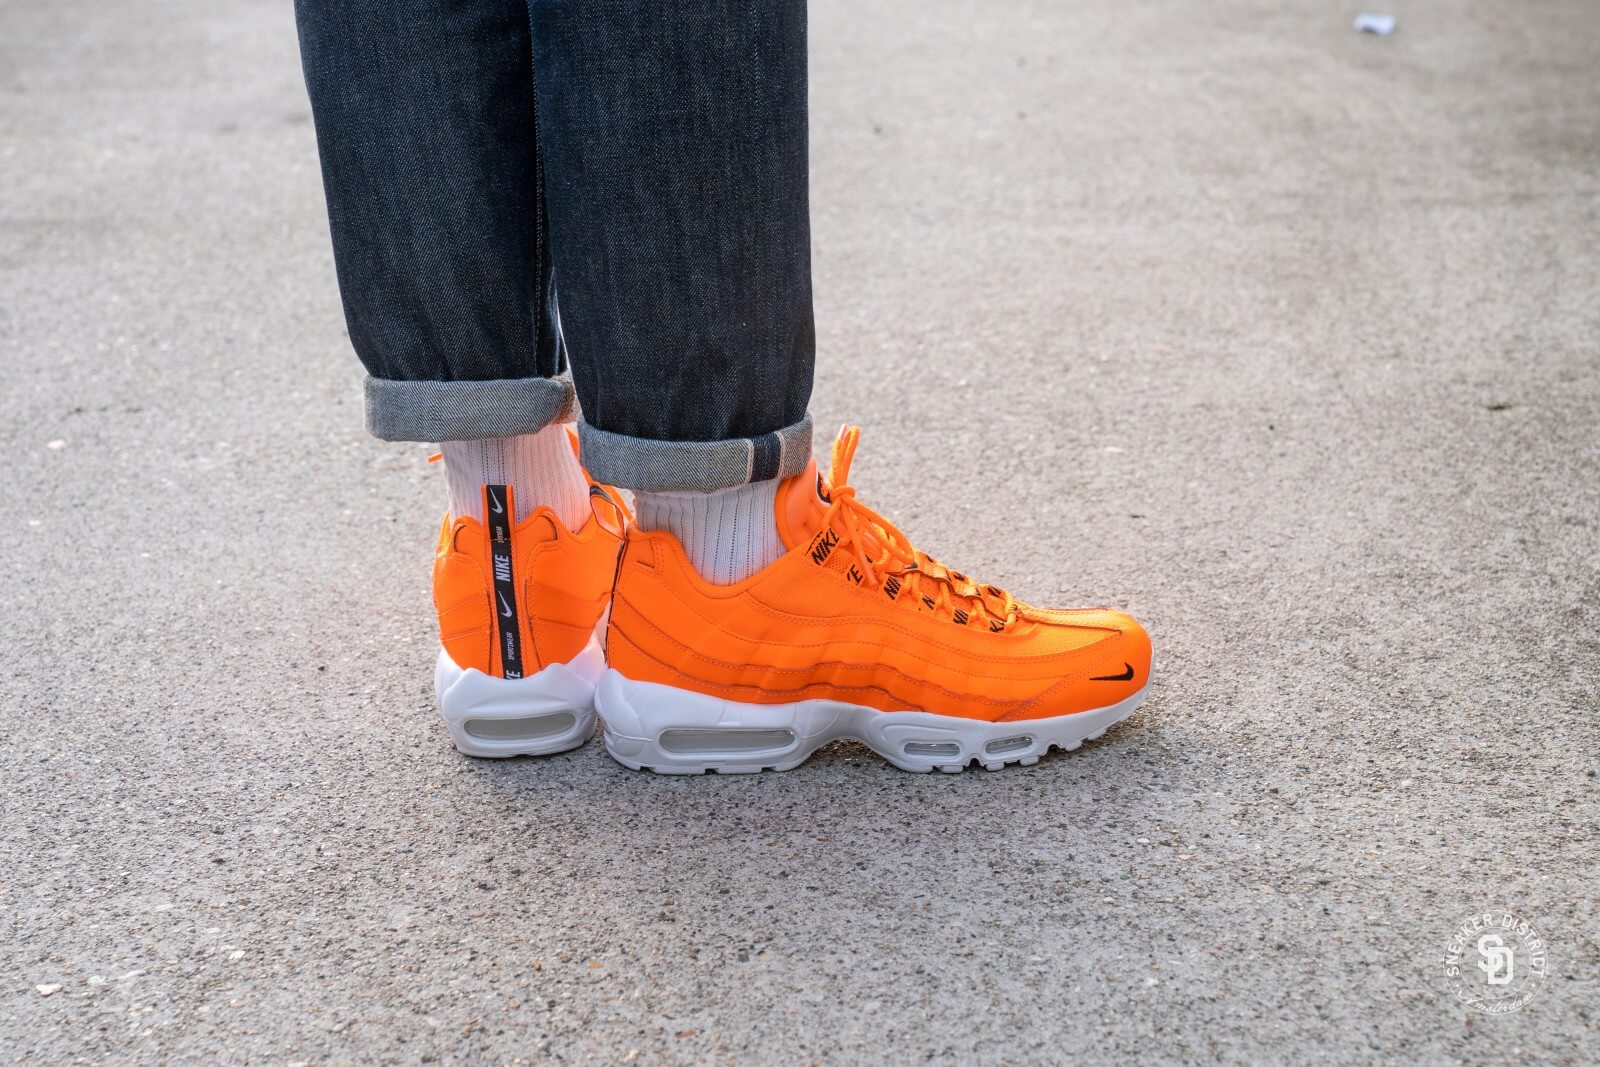 Nike Air Max 95 Premium Total OrangeBlack White 538416 801